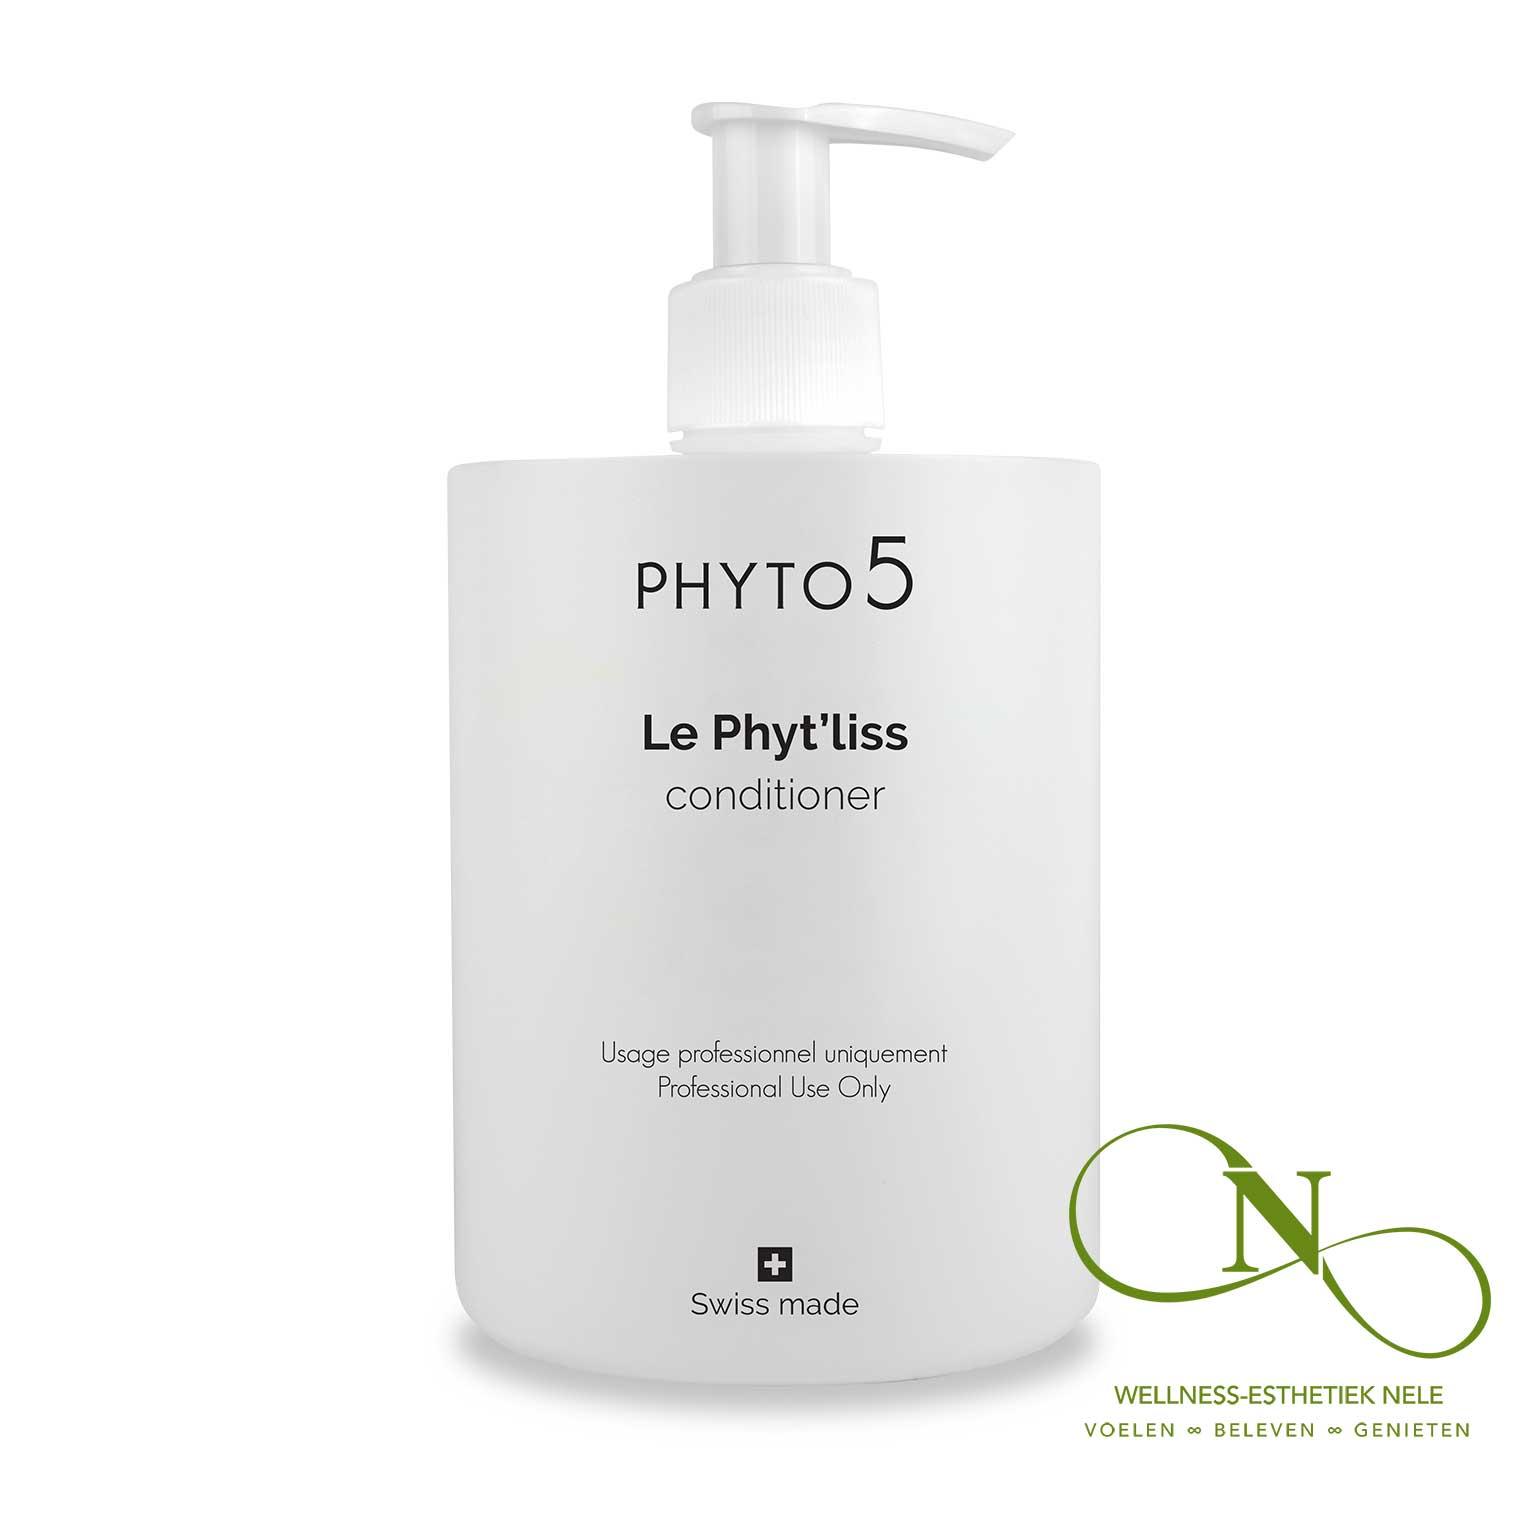 Phyto-5-Phyt'liss-Conditioner-Wellness-Esthetiek-Nele